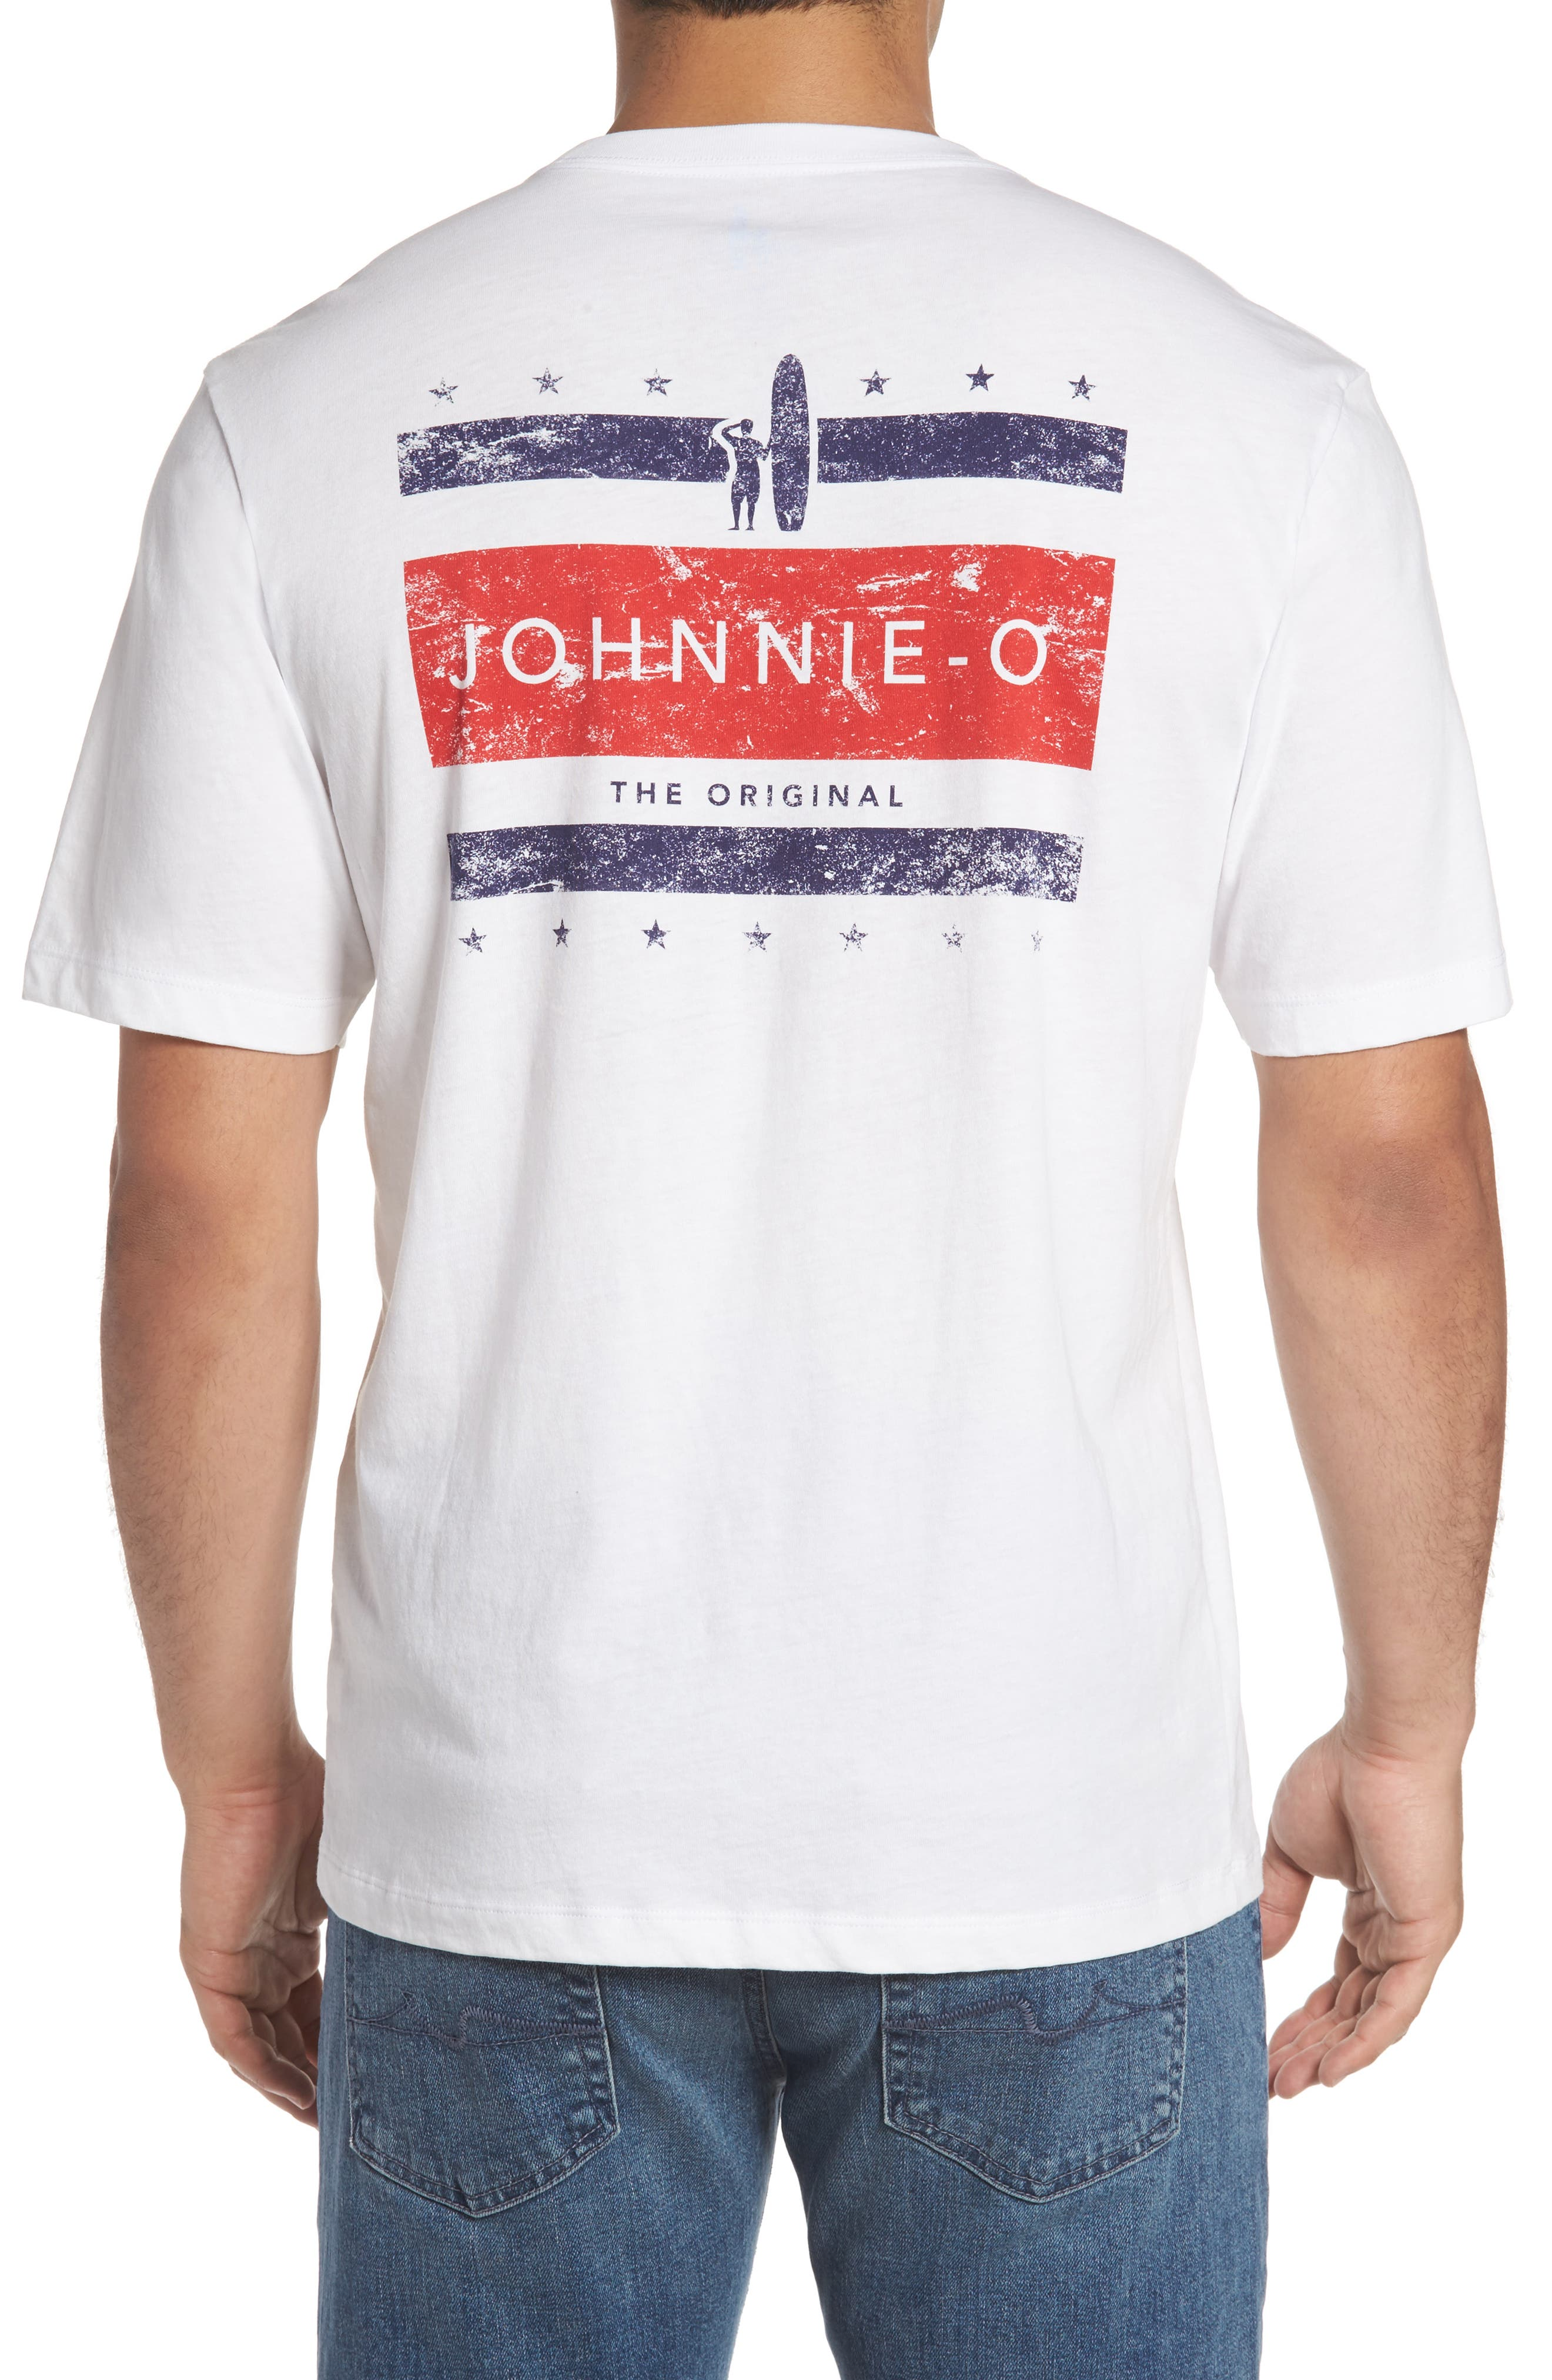 johnnie-O Union Graphic T-Shirt